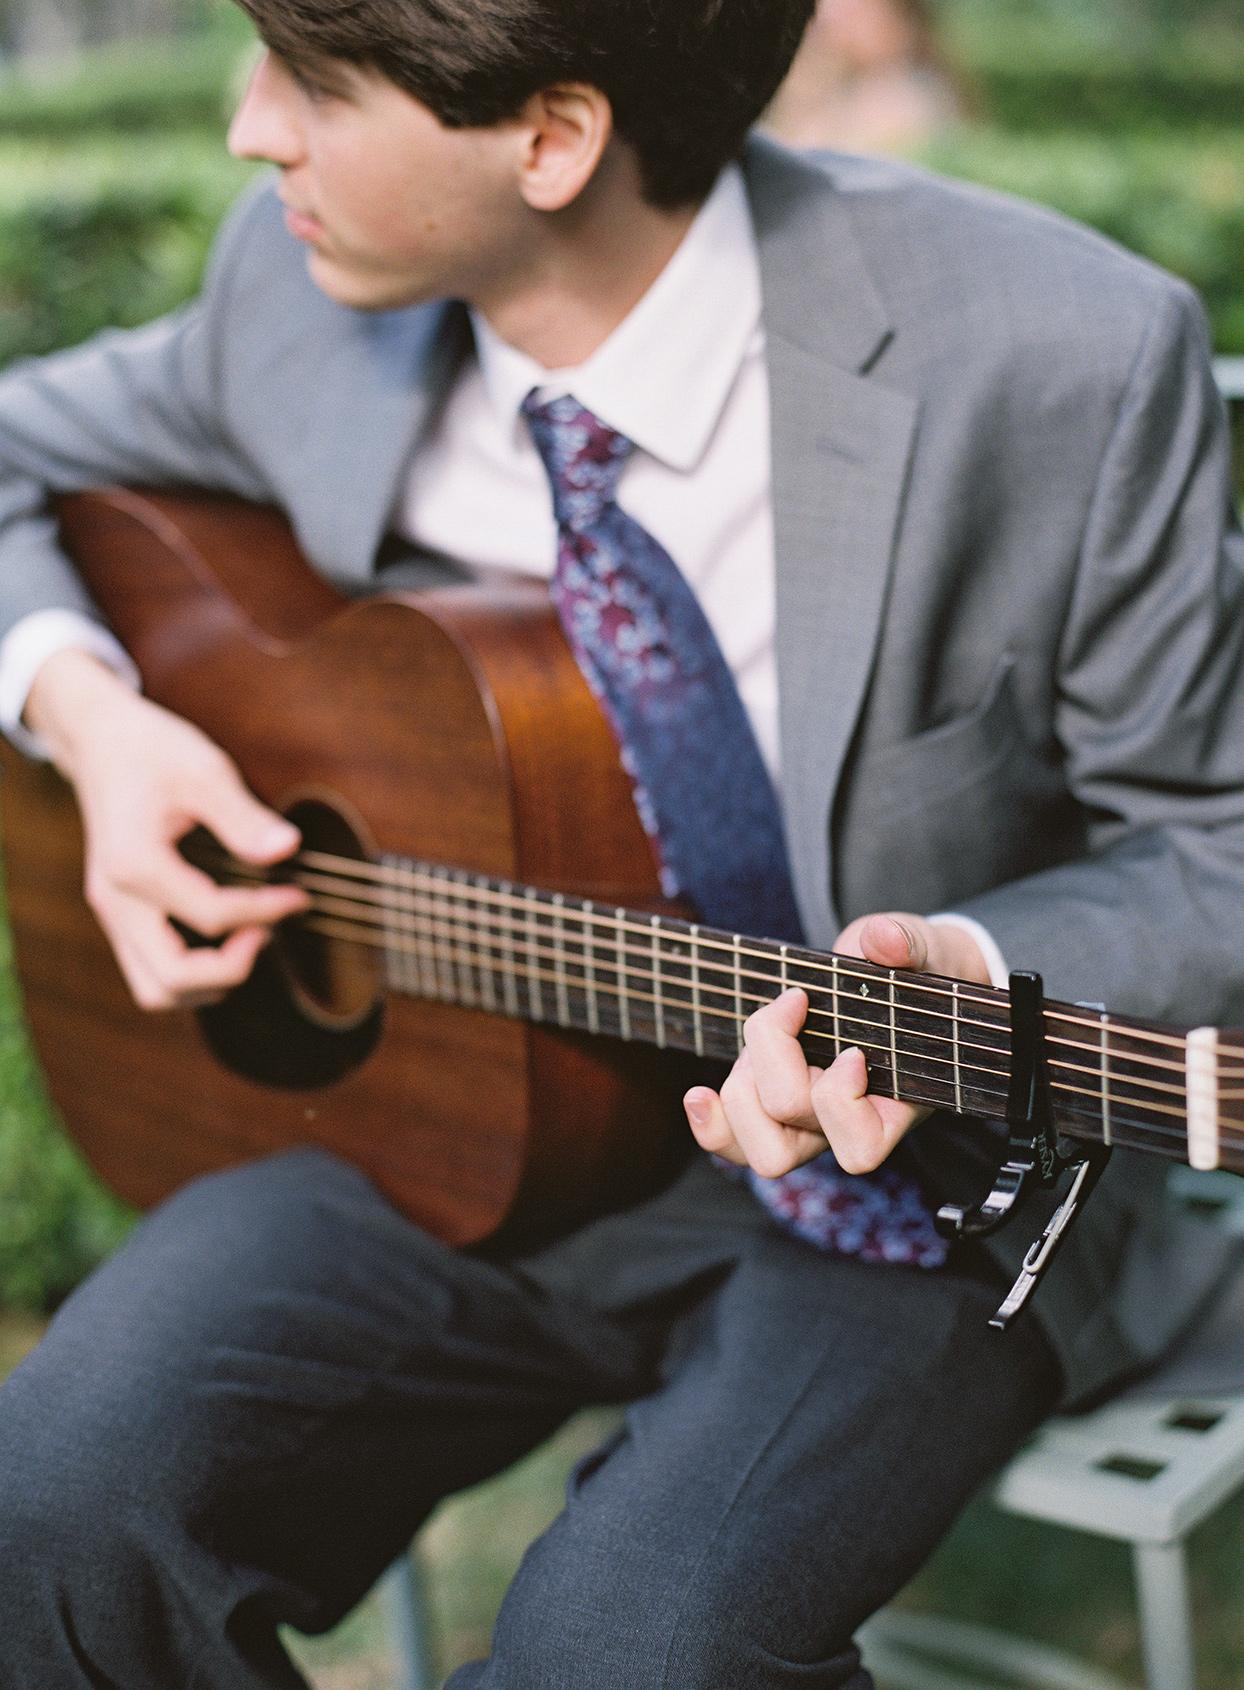 beverly steve wedding musician playing guitar